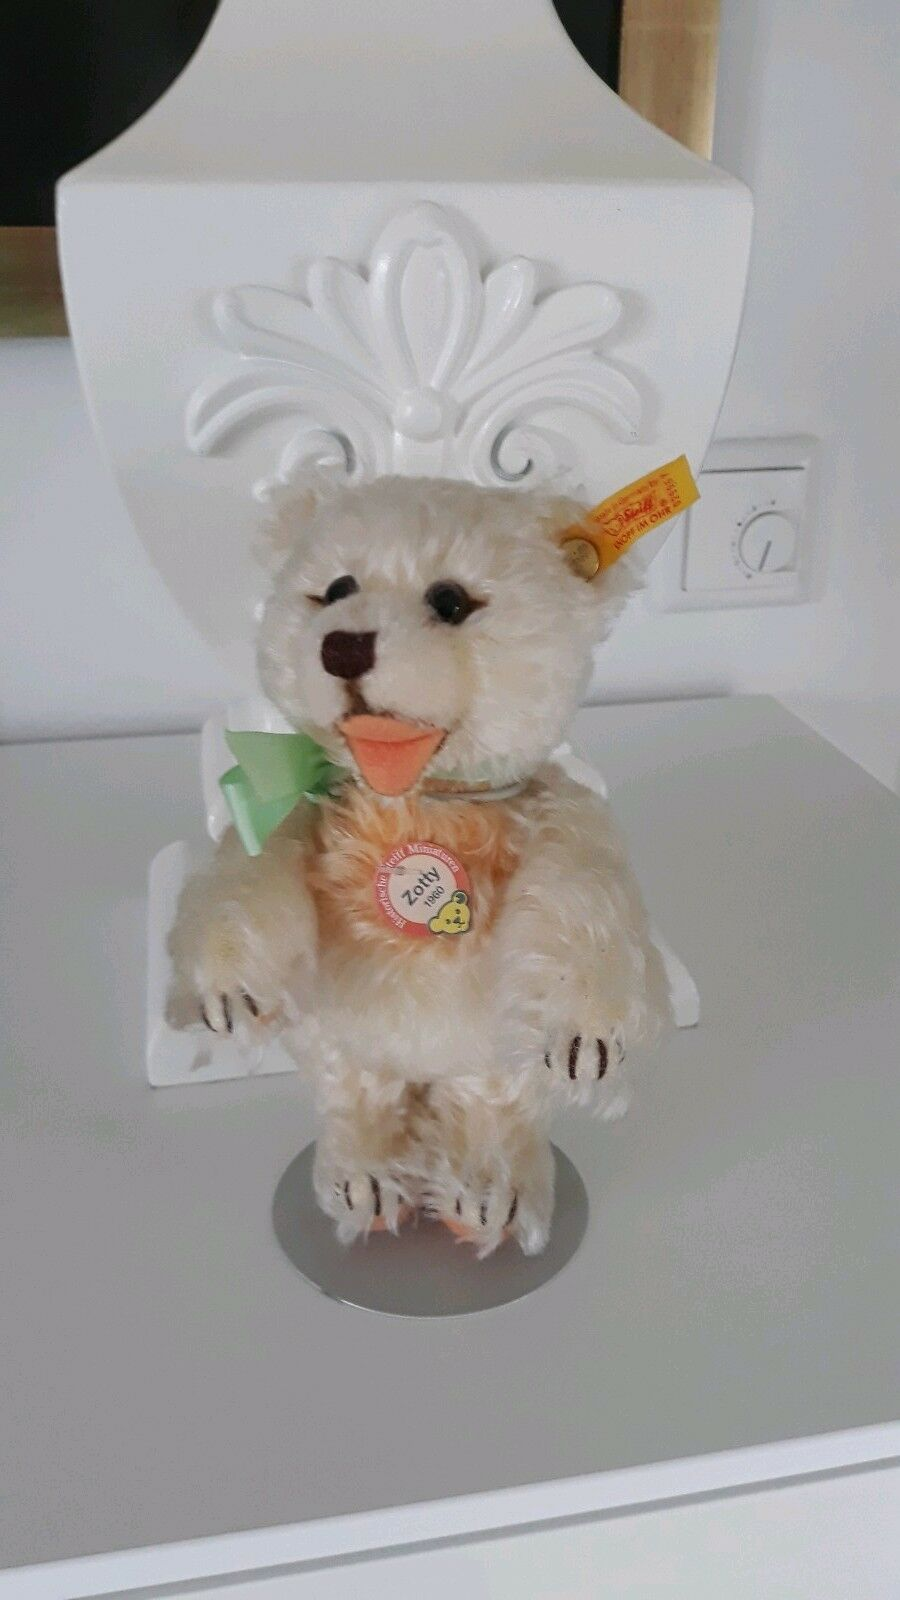 Steiff Miniatur Teddybär 1960 Zotty weiß/apricot mit Ständer ca.17 cm, Neu